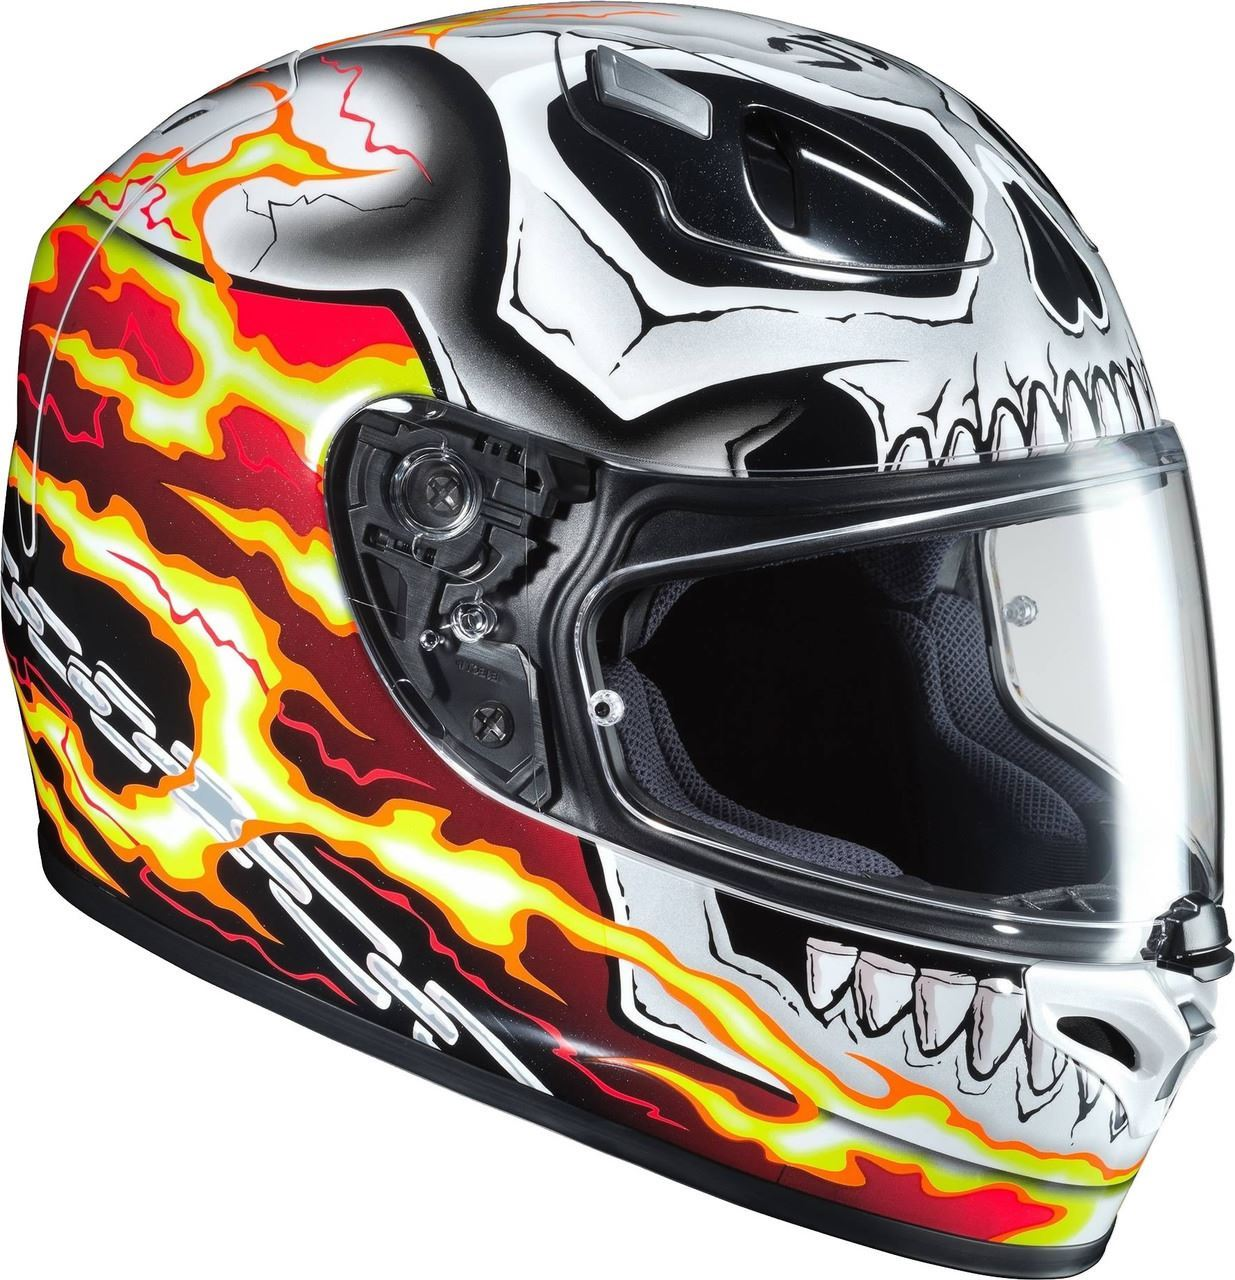 901ead18 HJC Motorcycle Helmets from Fowlers of Bristol - Fowlers Online Shop